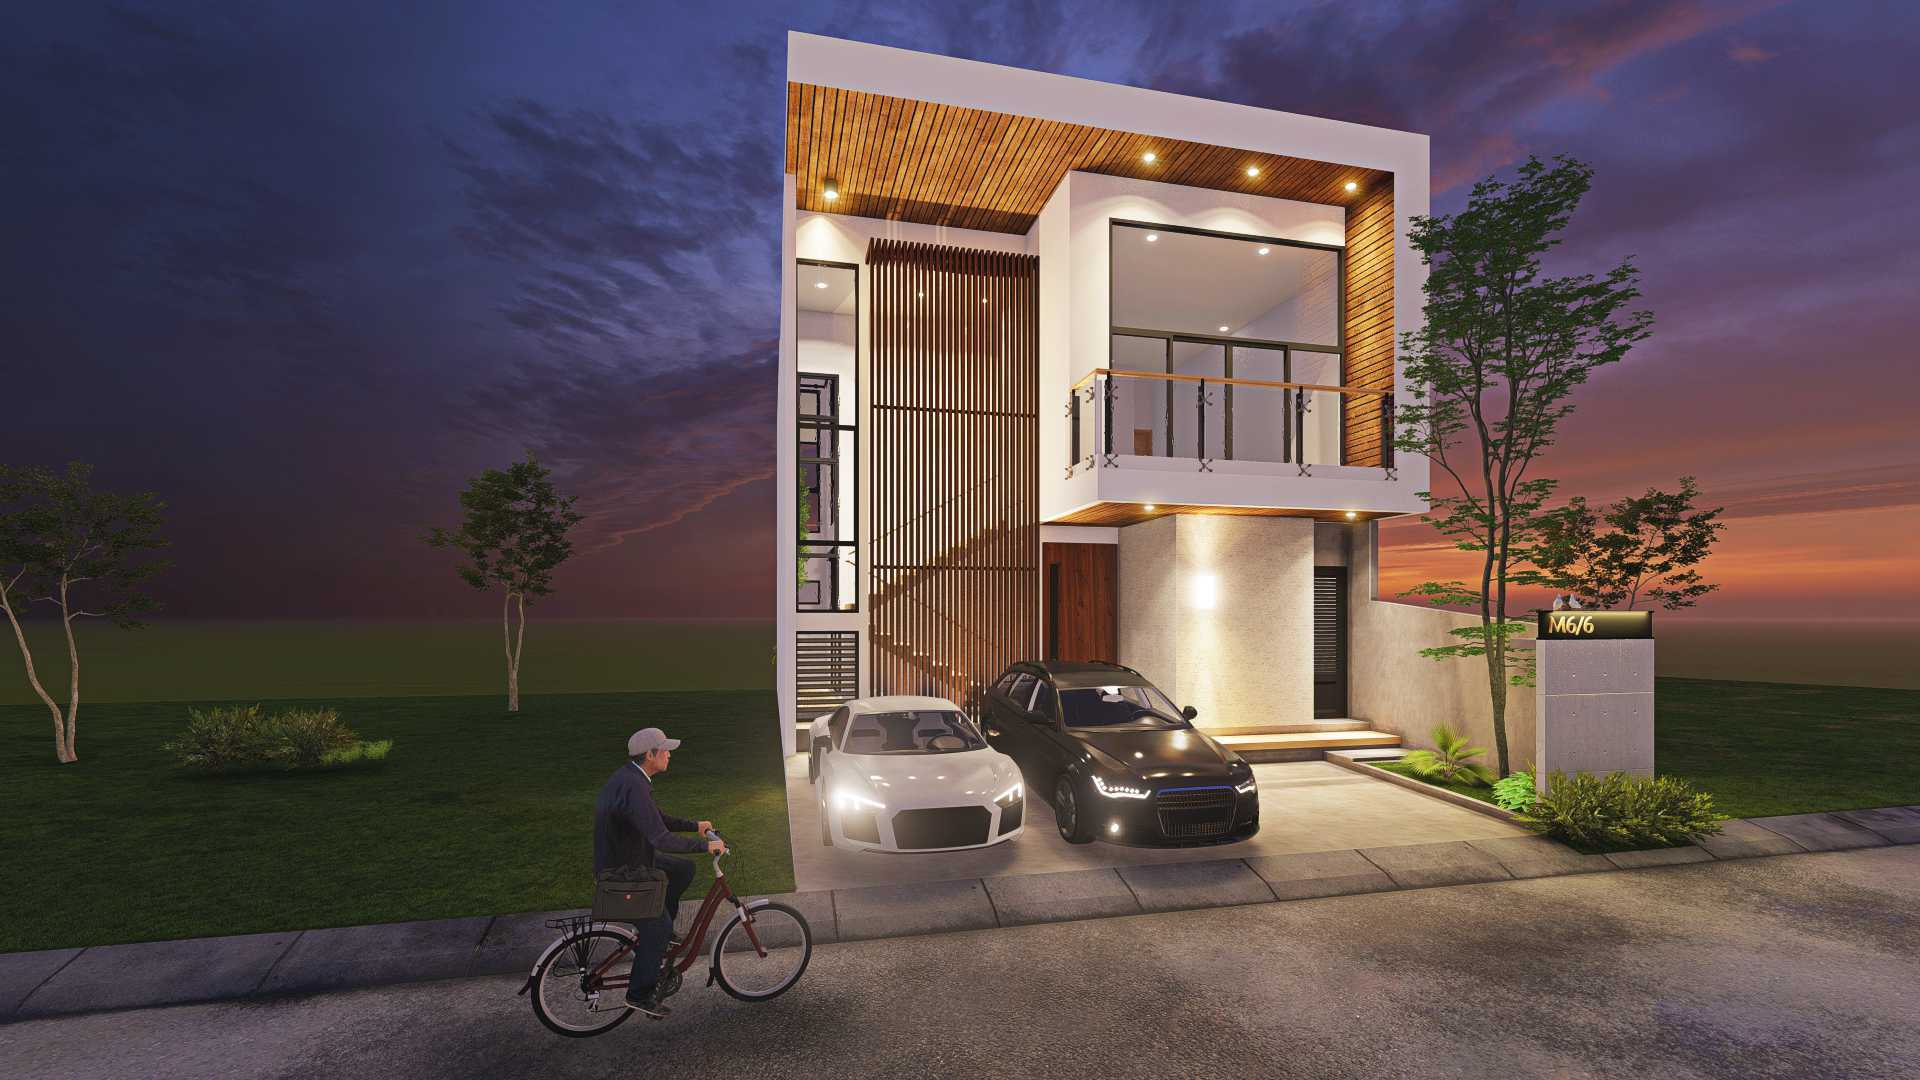 Maxi Andika Architect Cj - House Jl. Jangli Krajan No.202B, Jatingaleh, Kec. Candisari, Kota Semarang, Jawa Tengah 50432, Indonesia Semarang, Kota Semarang, Jawa Tengah, Indonesia Maxi-Andika-Cj-House   126653